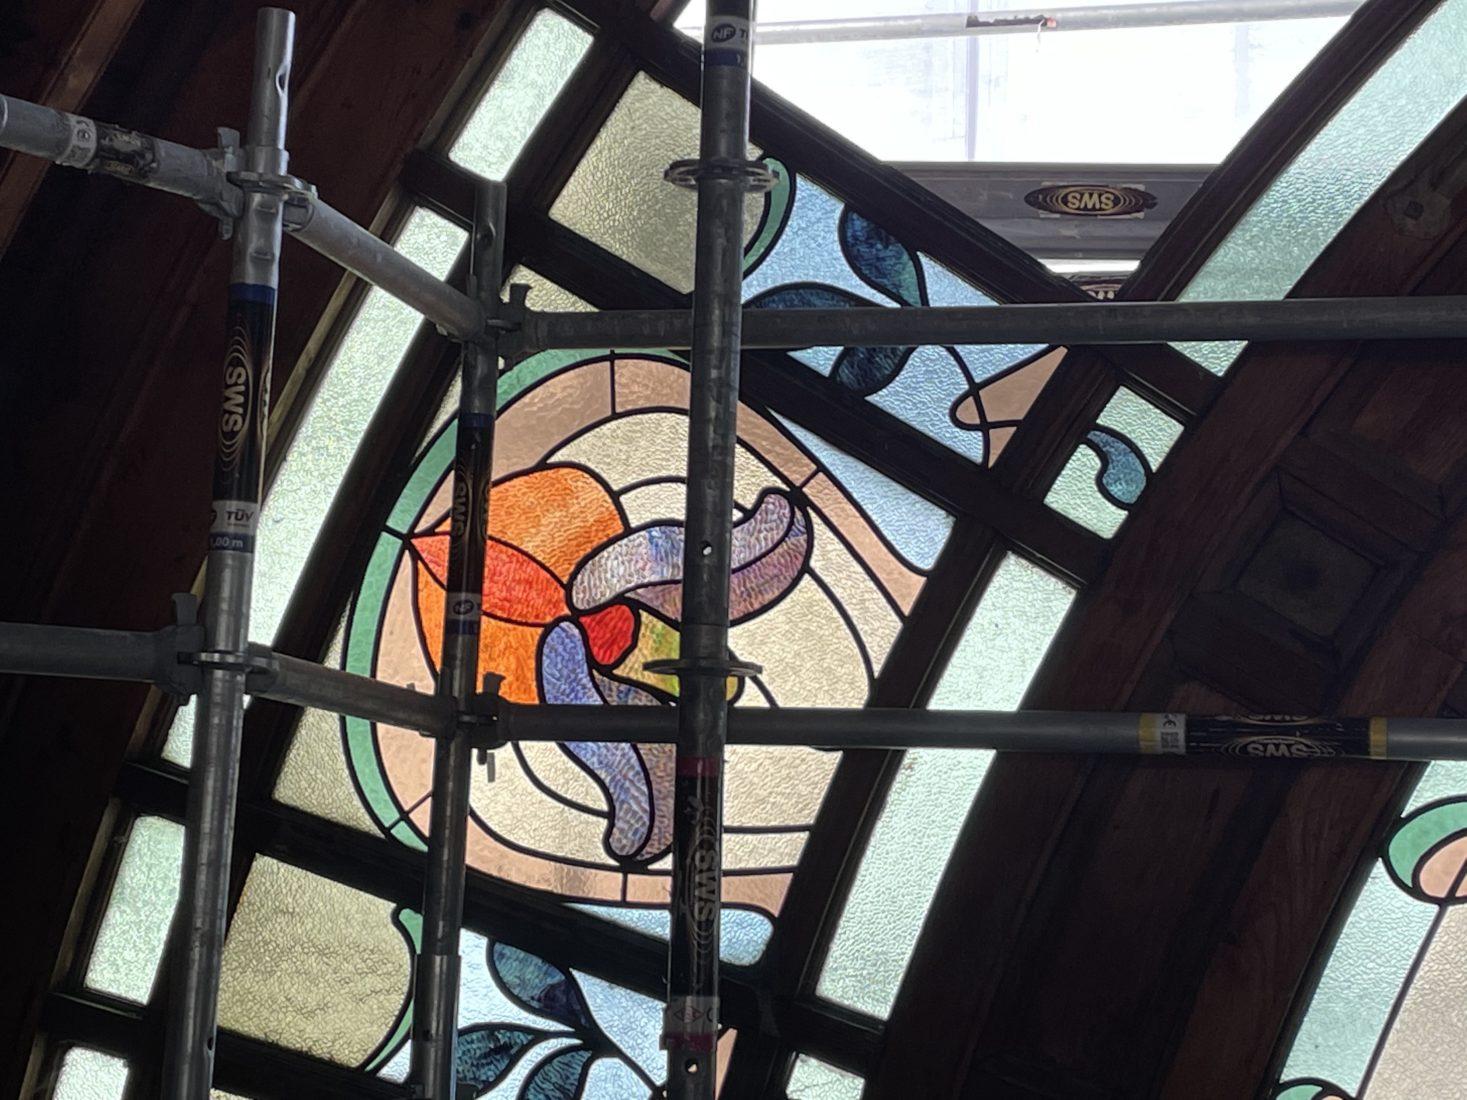 Buvette Cachat, restauration des vitraux semi-circulaires